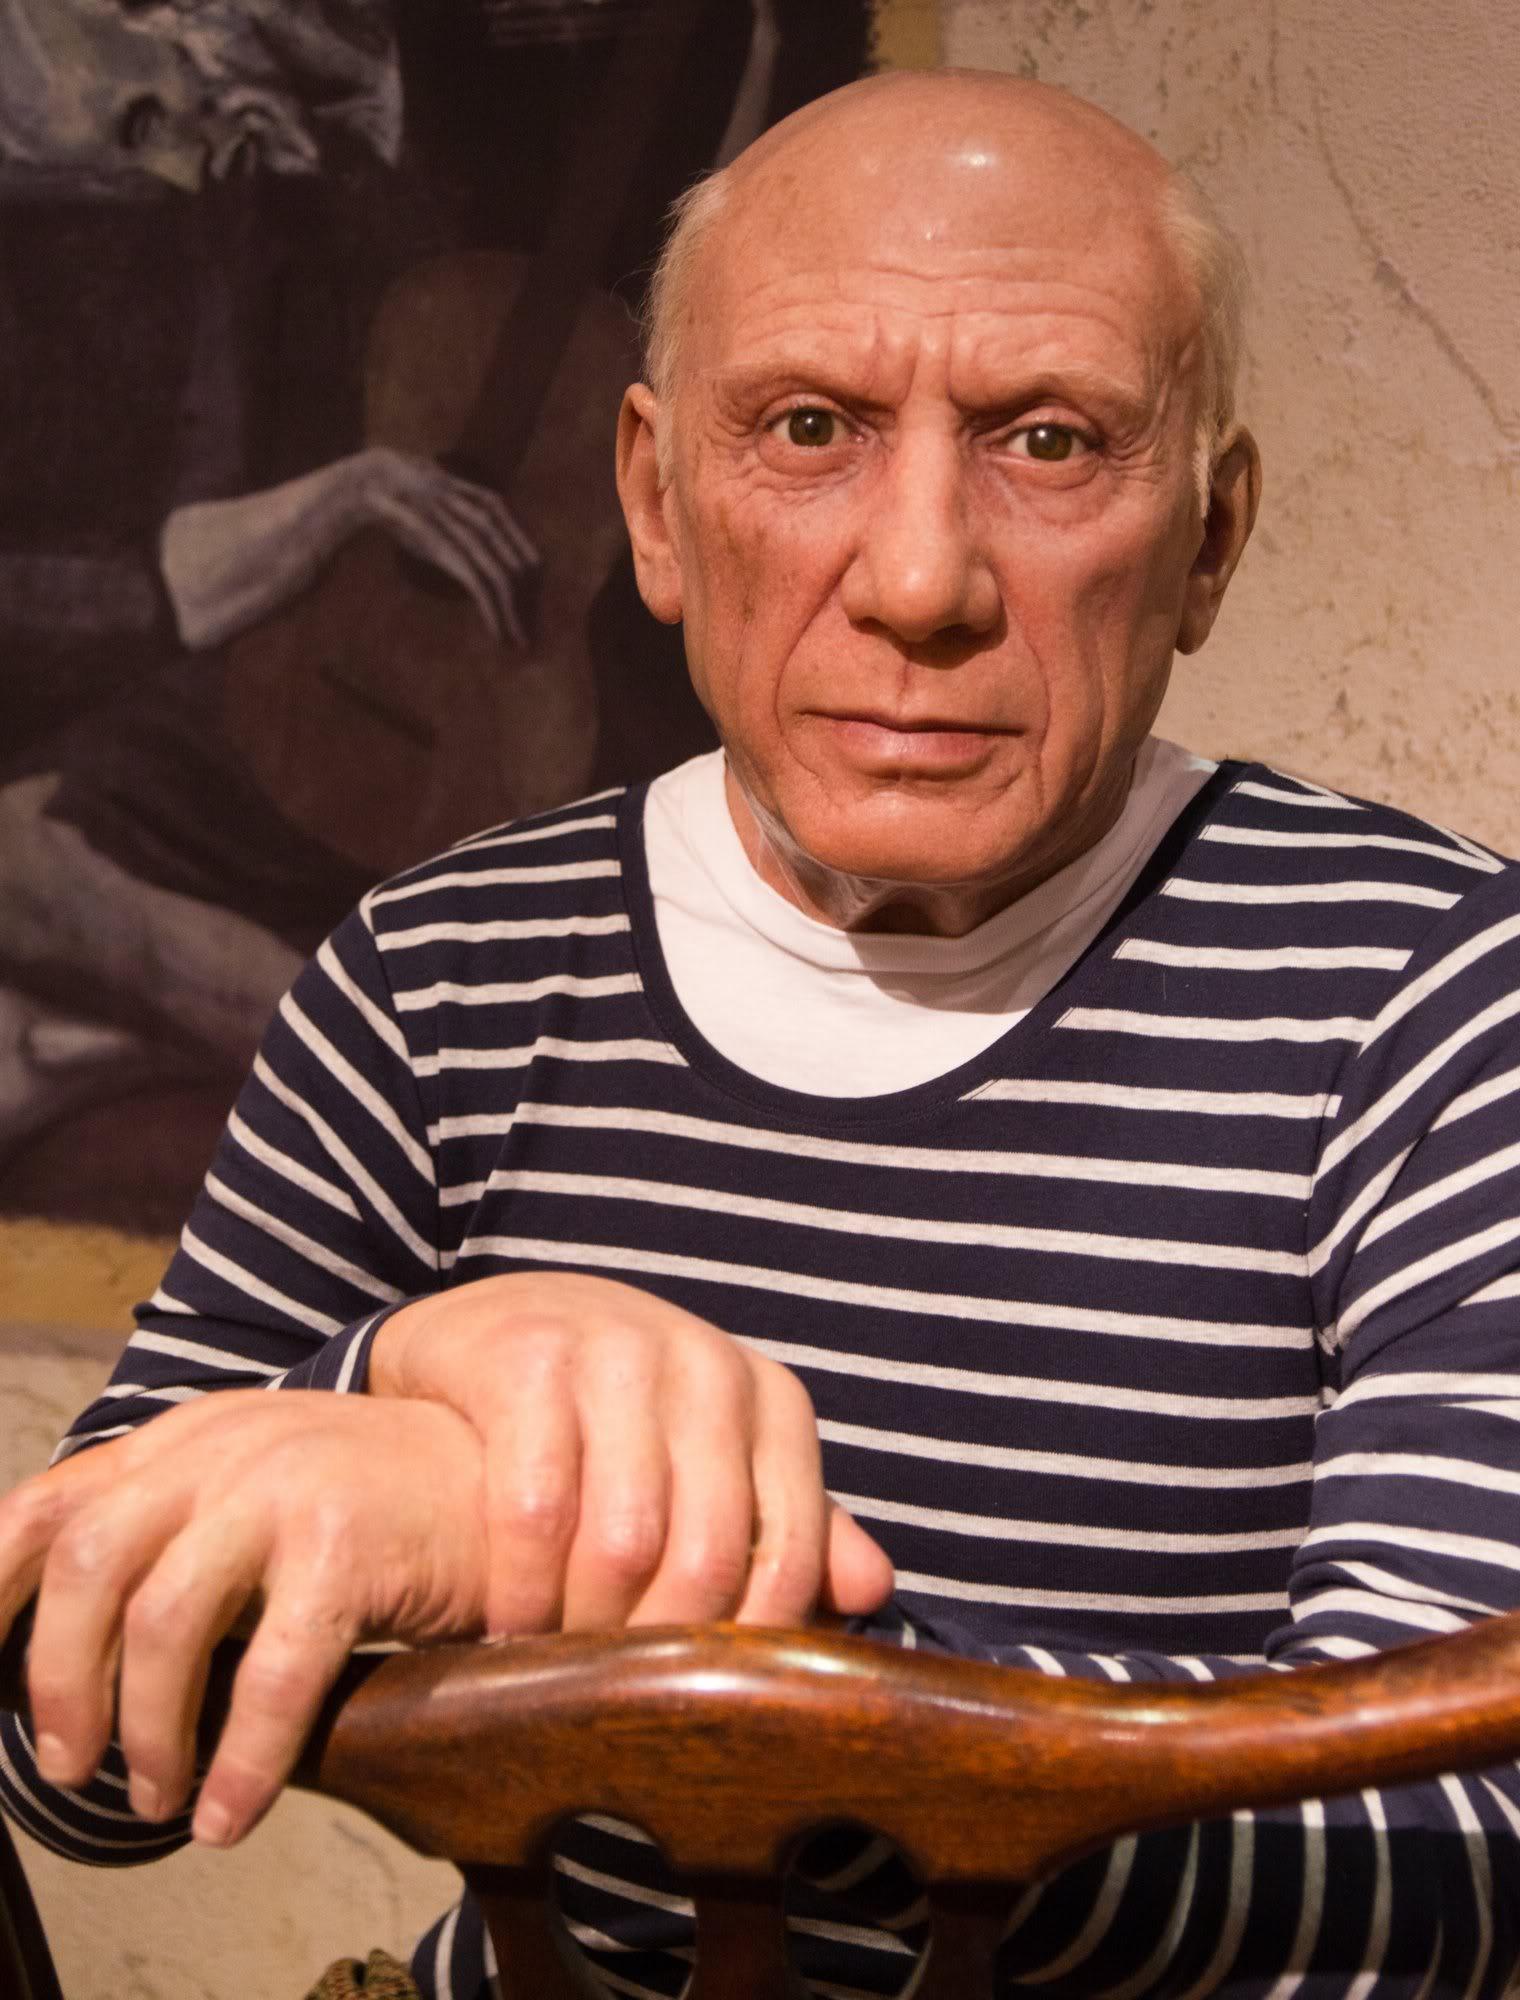 Image - Pablo Picasso k.jpg | Epic Rap Battles of History ...